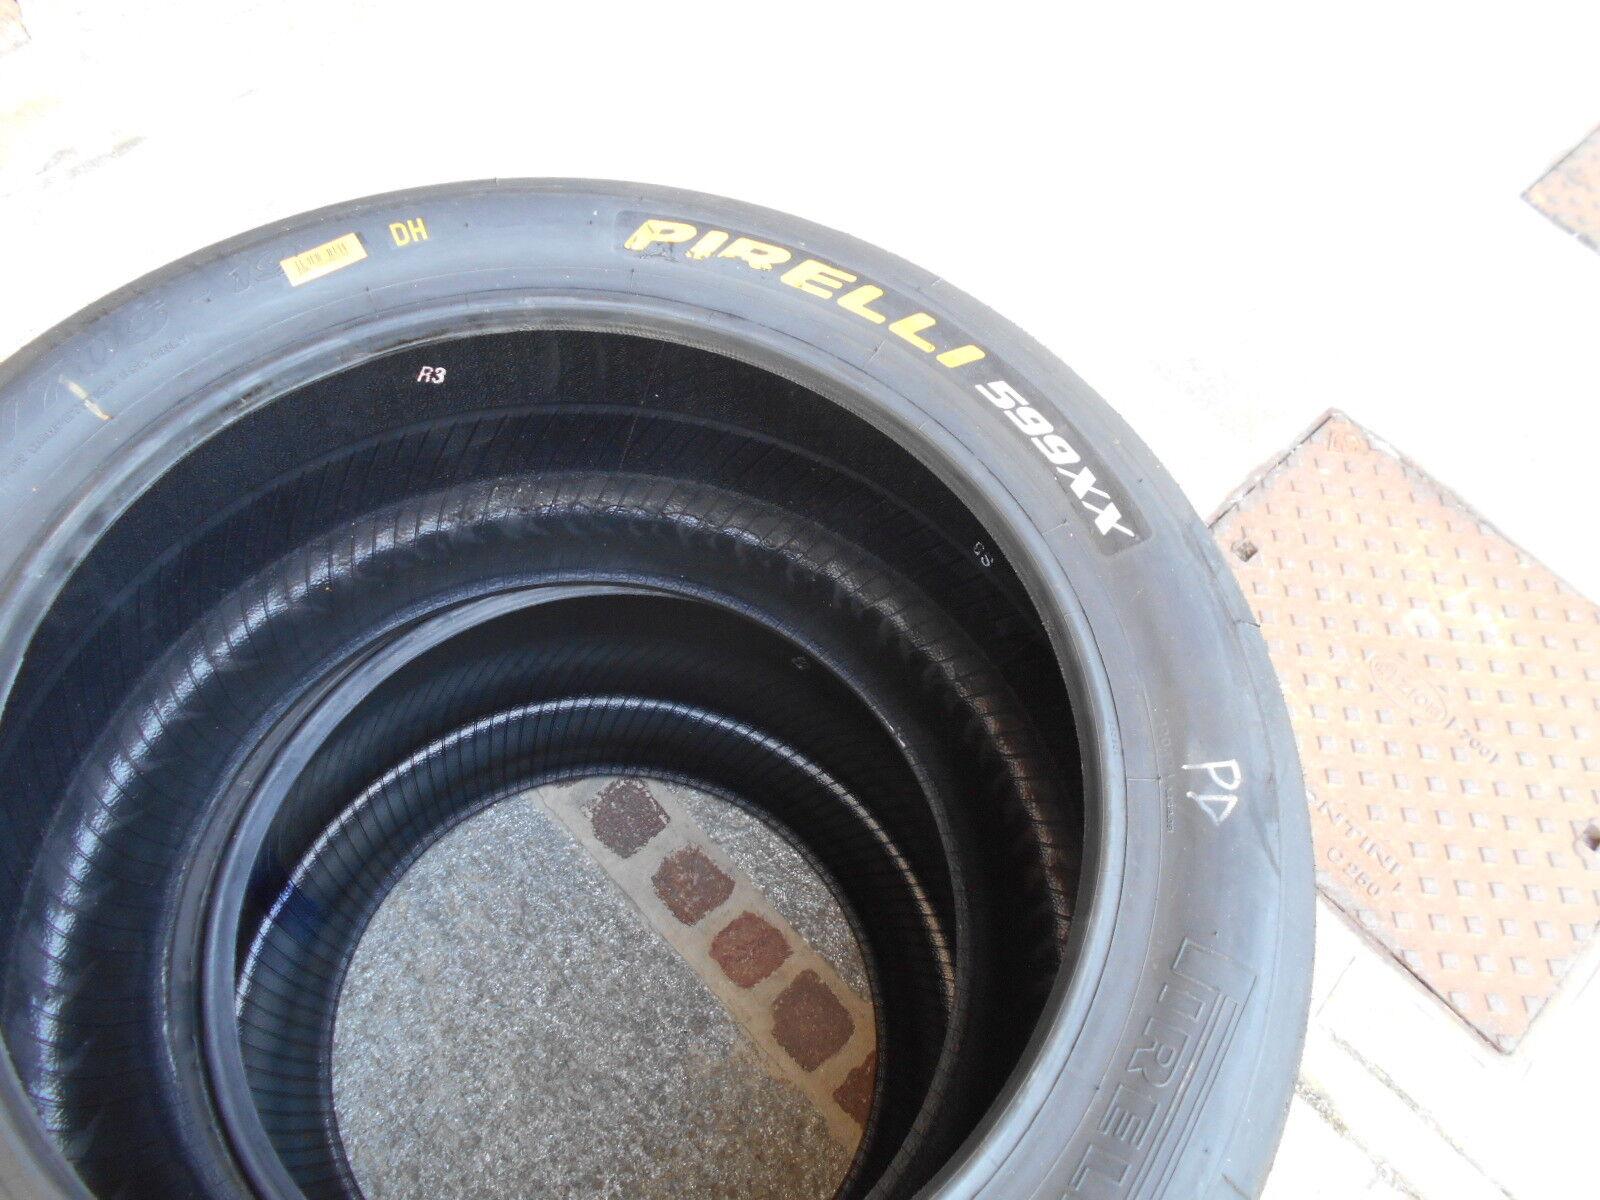 PIR002 CAUCHO RUEDA FERRARI 599XX TRASERO PIRELLI